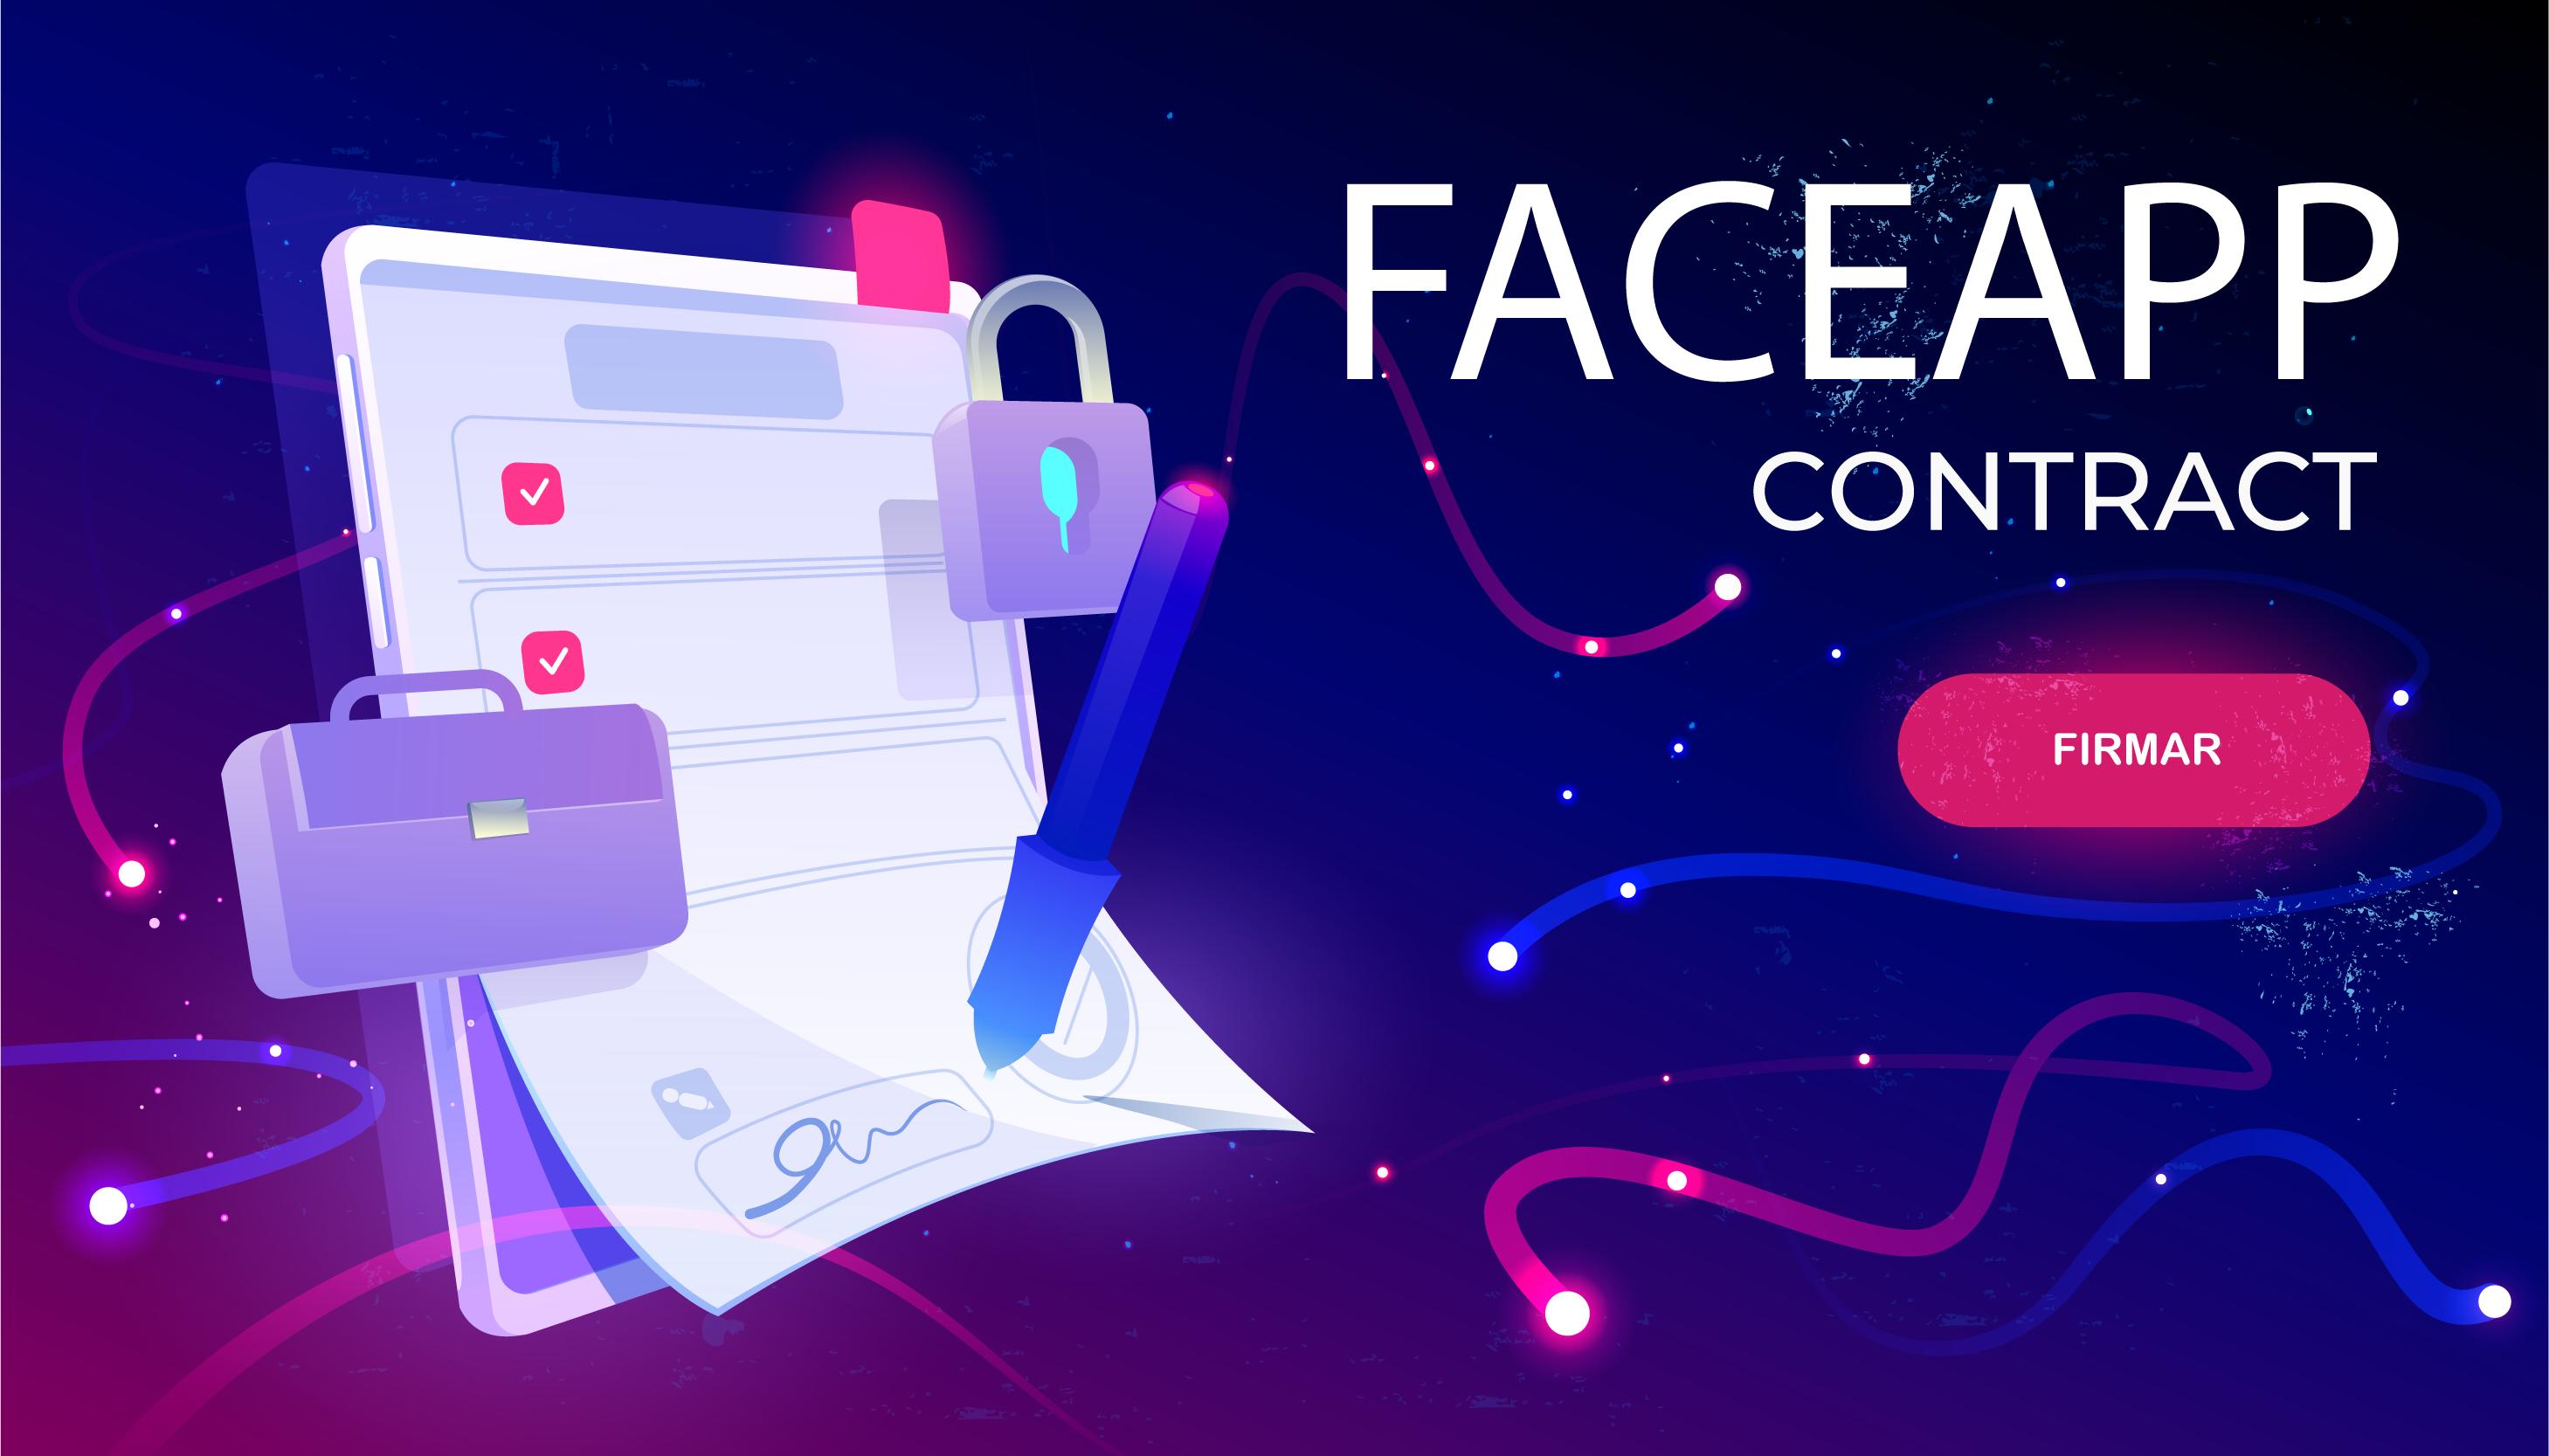 faceapp-contract-01